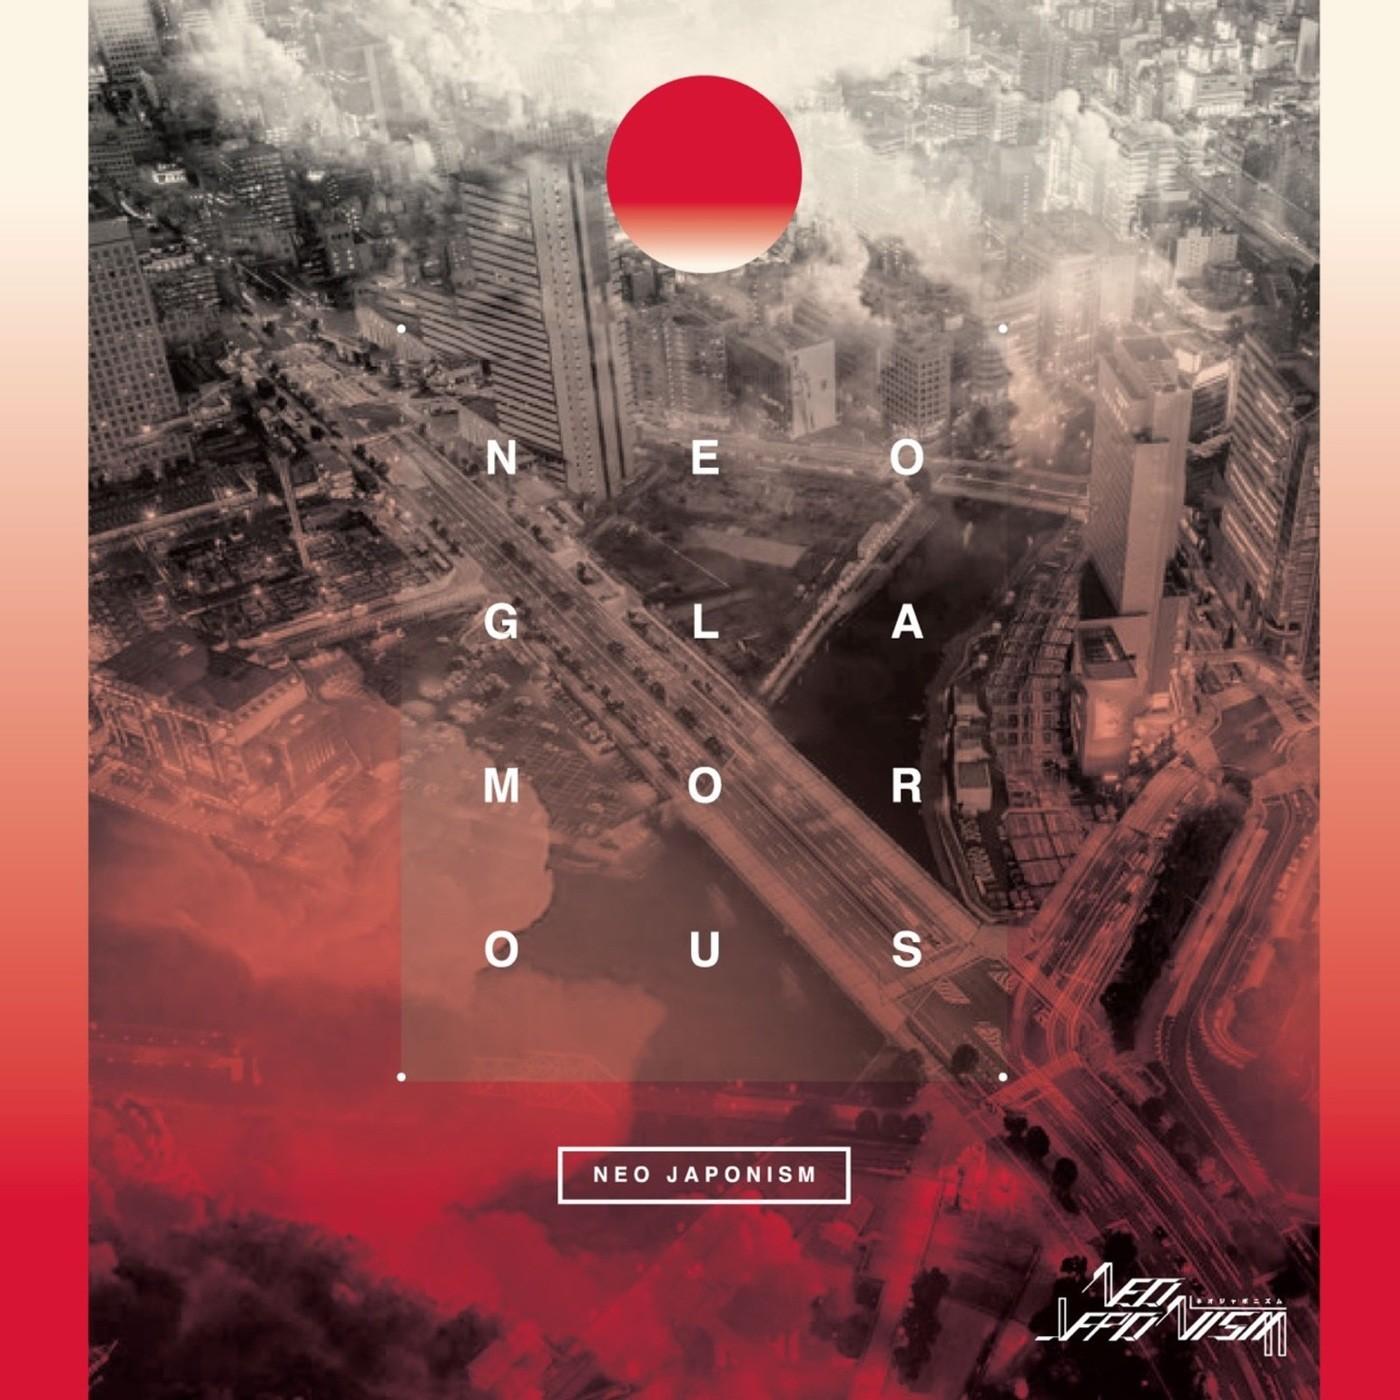 NEO JAPONISM – NEO GLAMOROUS [FLAC / WEB] [2018.06.15]